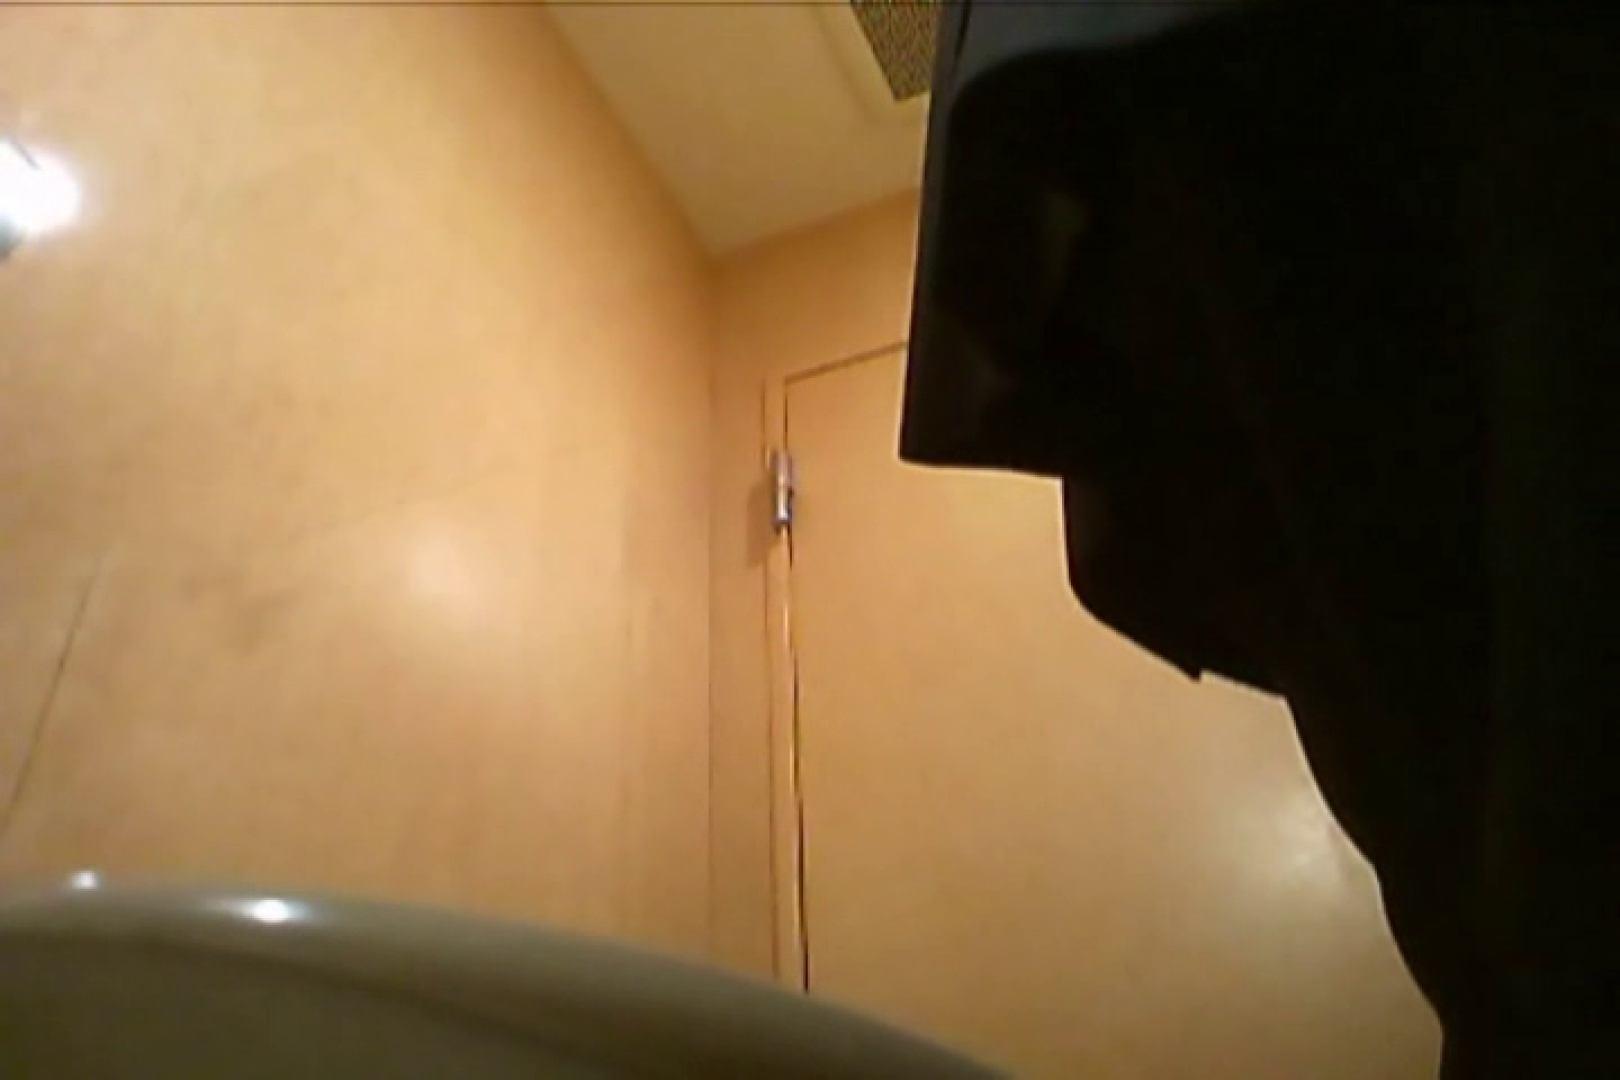 SEASON 2ND!掴み取りさんの洗面所覗き!in新幹線!VOL.08 覗きシーン ゲイ無修正ビデオ画像 63枚 8